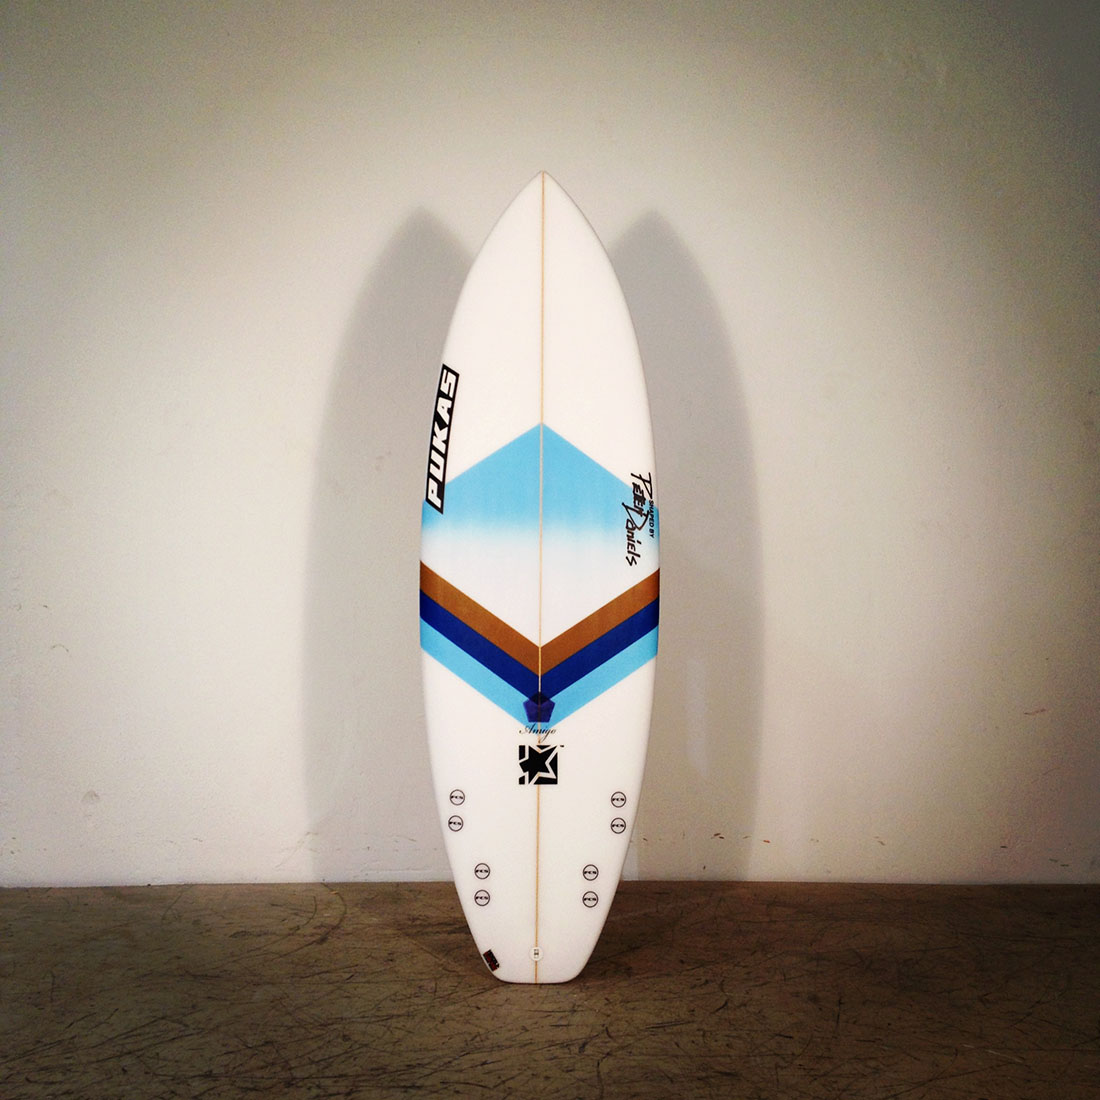 Pukassurfboardspeterdanielsamigosur